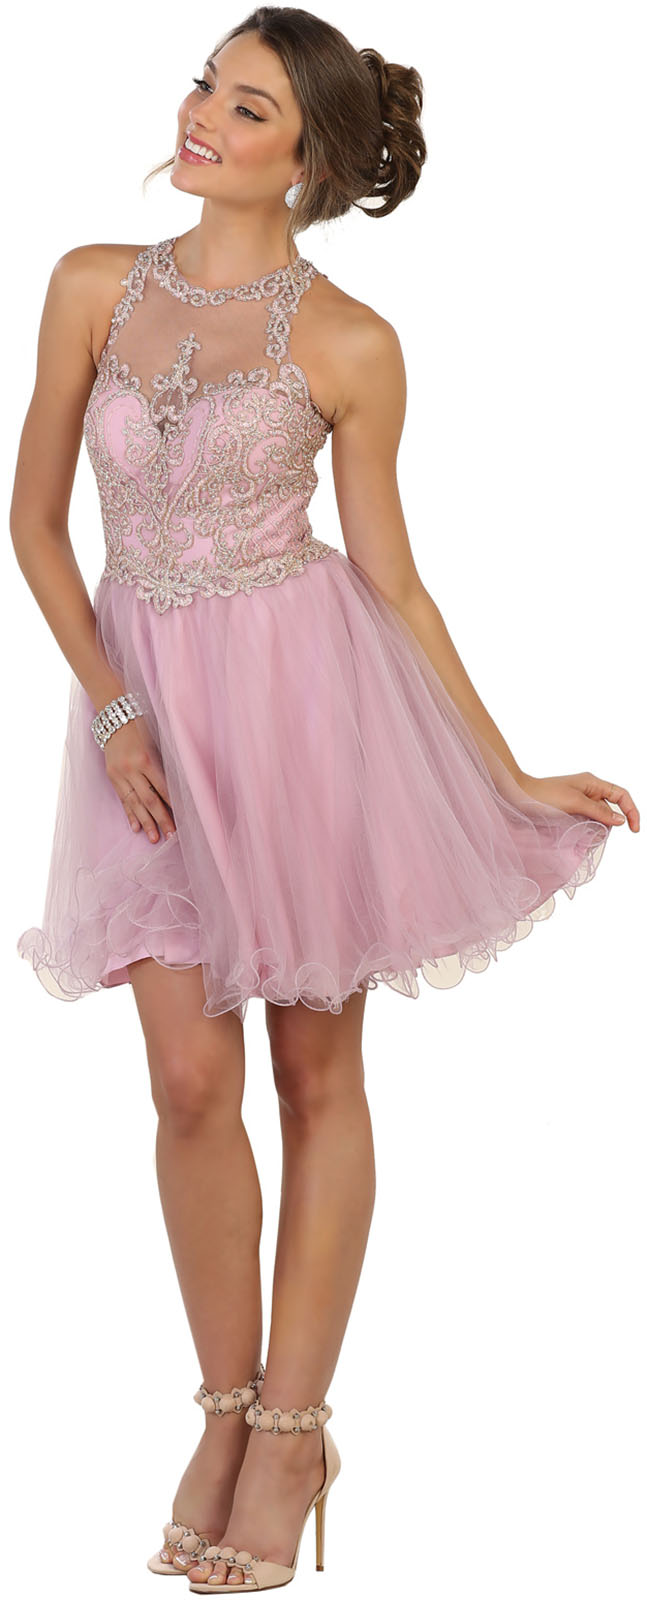 Short Wedding Guest Dresses